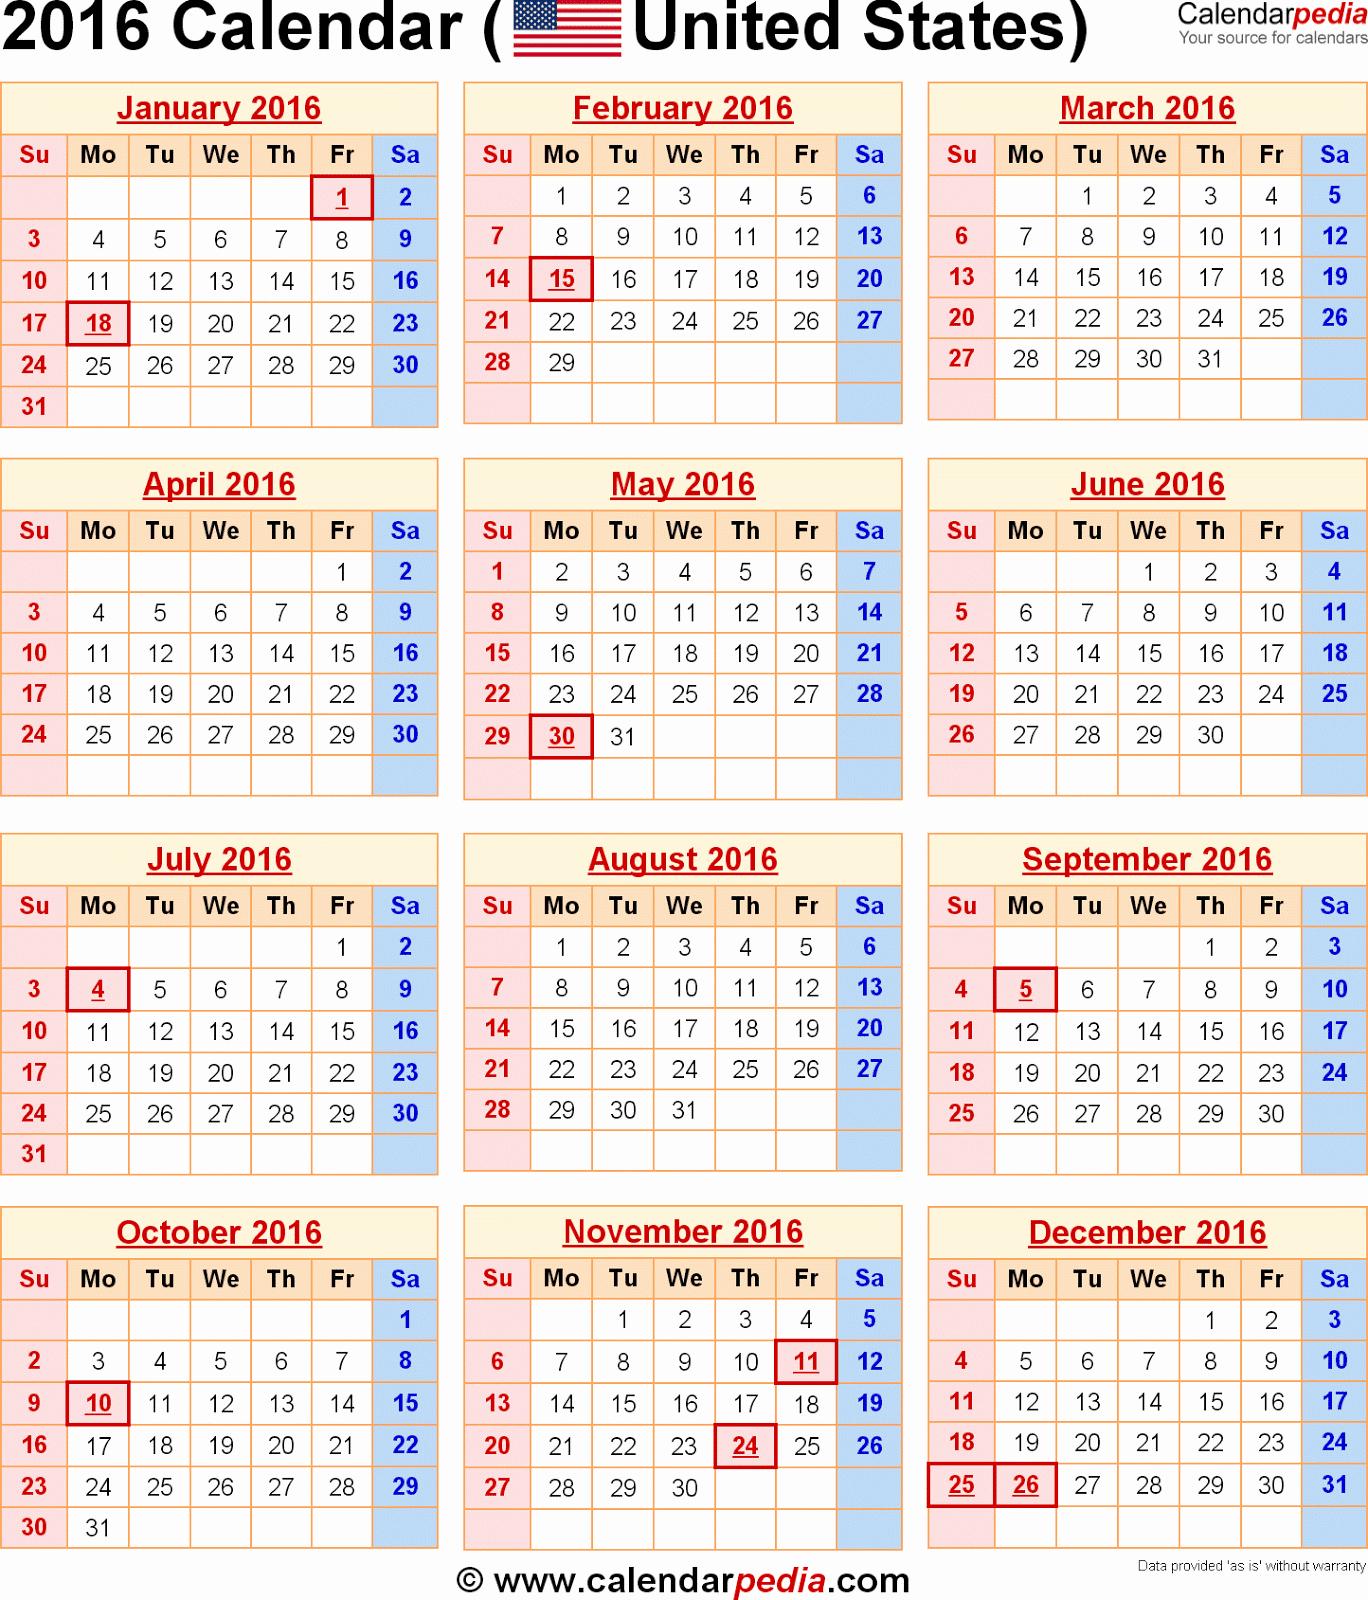 Calendar 2016 Printable with Holidays Lovely 2016 Calendar with Federal Holidays Printable